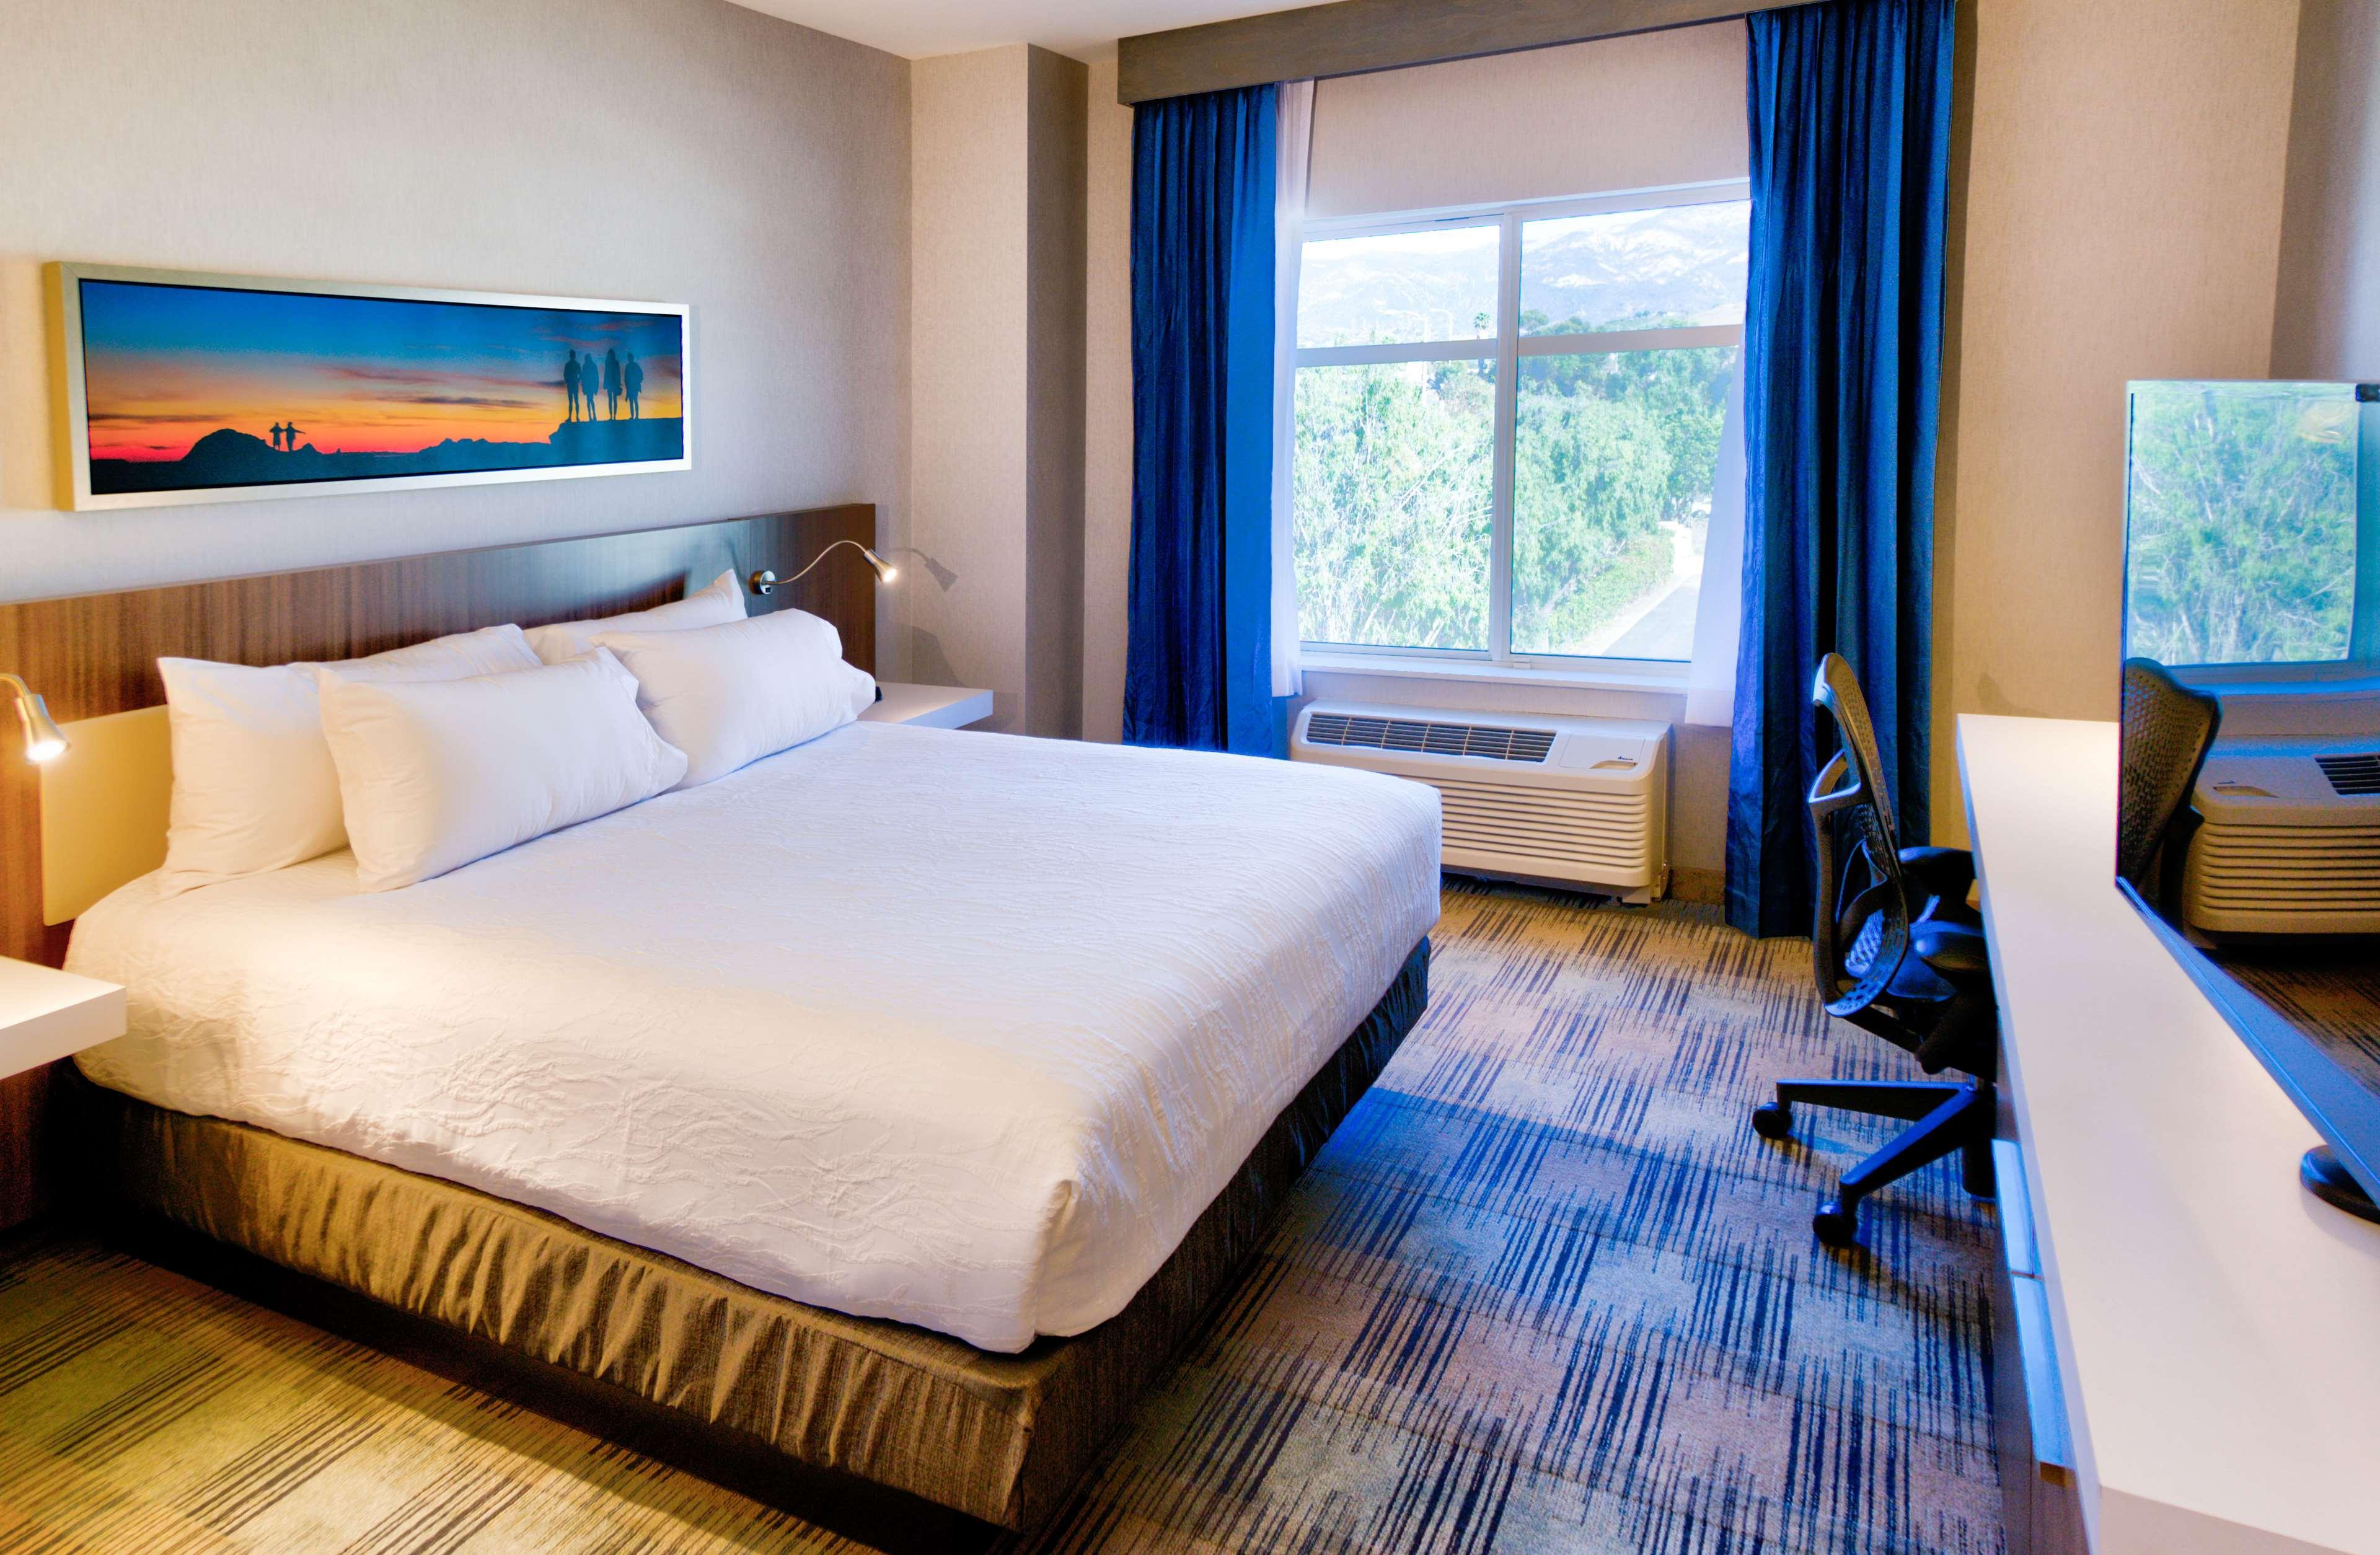 Hilton Garden Inn Santa Barbara/Goleta image 31